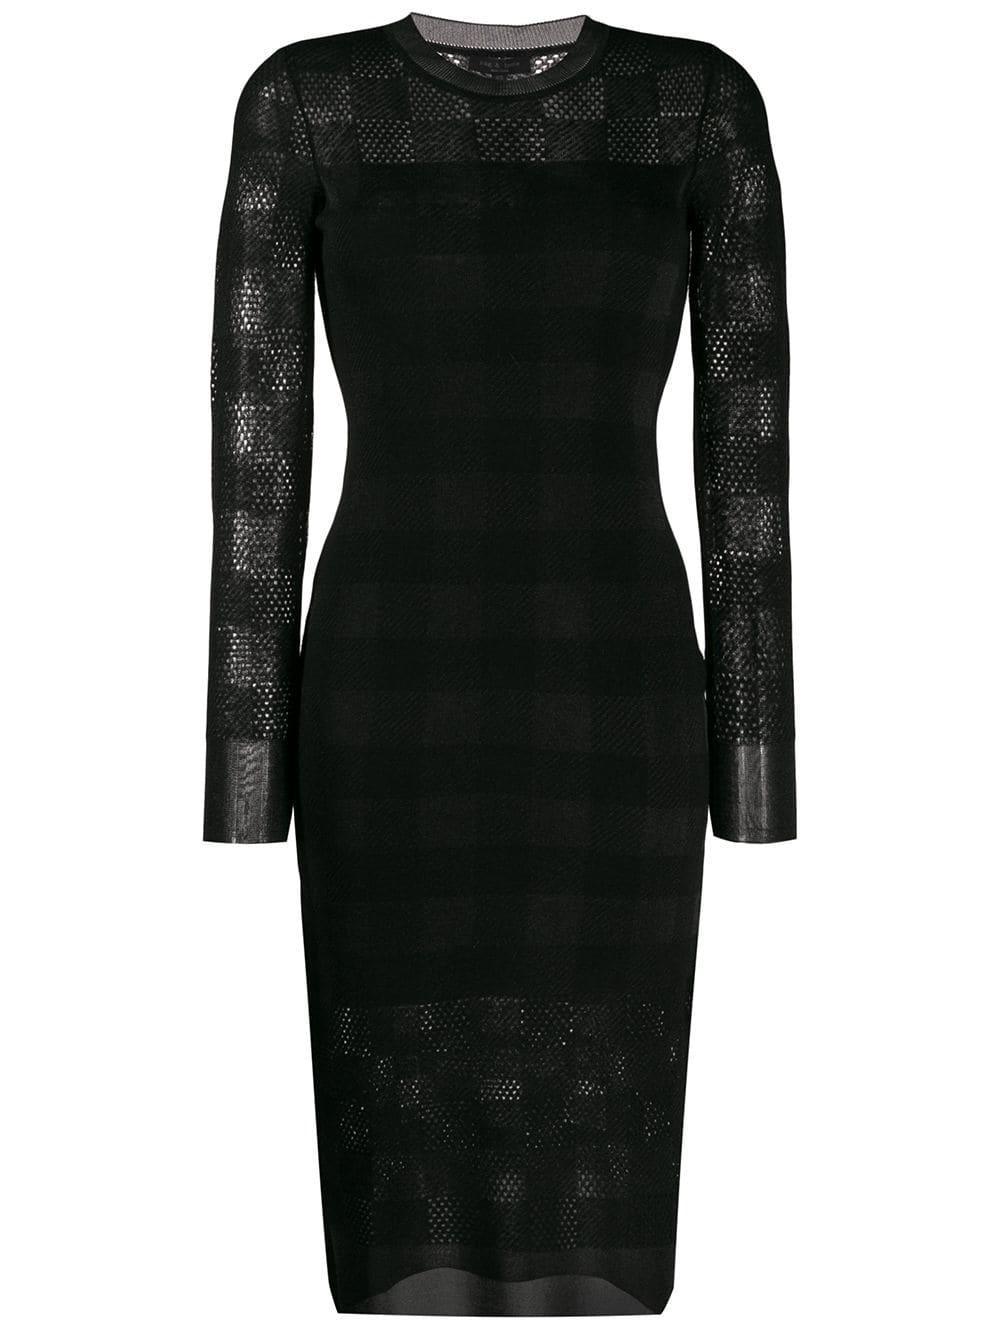 Charlotte Check Long Sleeve Dress Item # WAS19FS007KG07